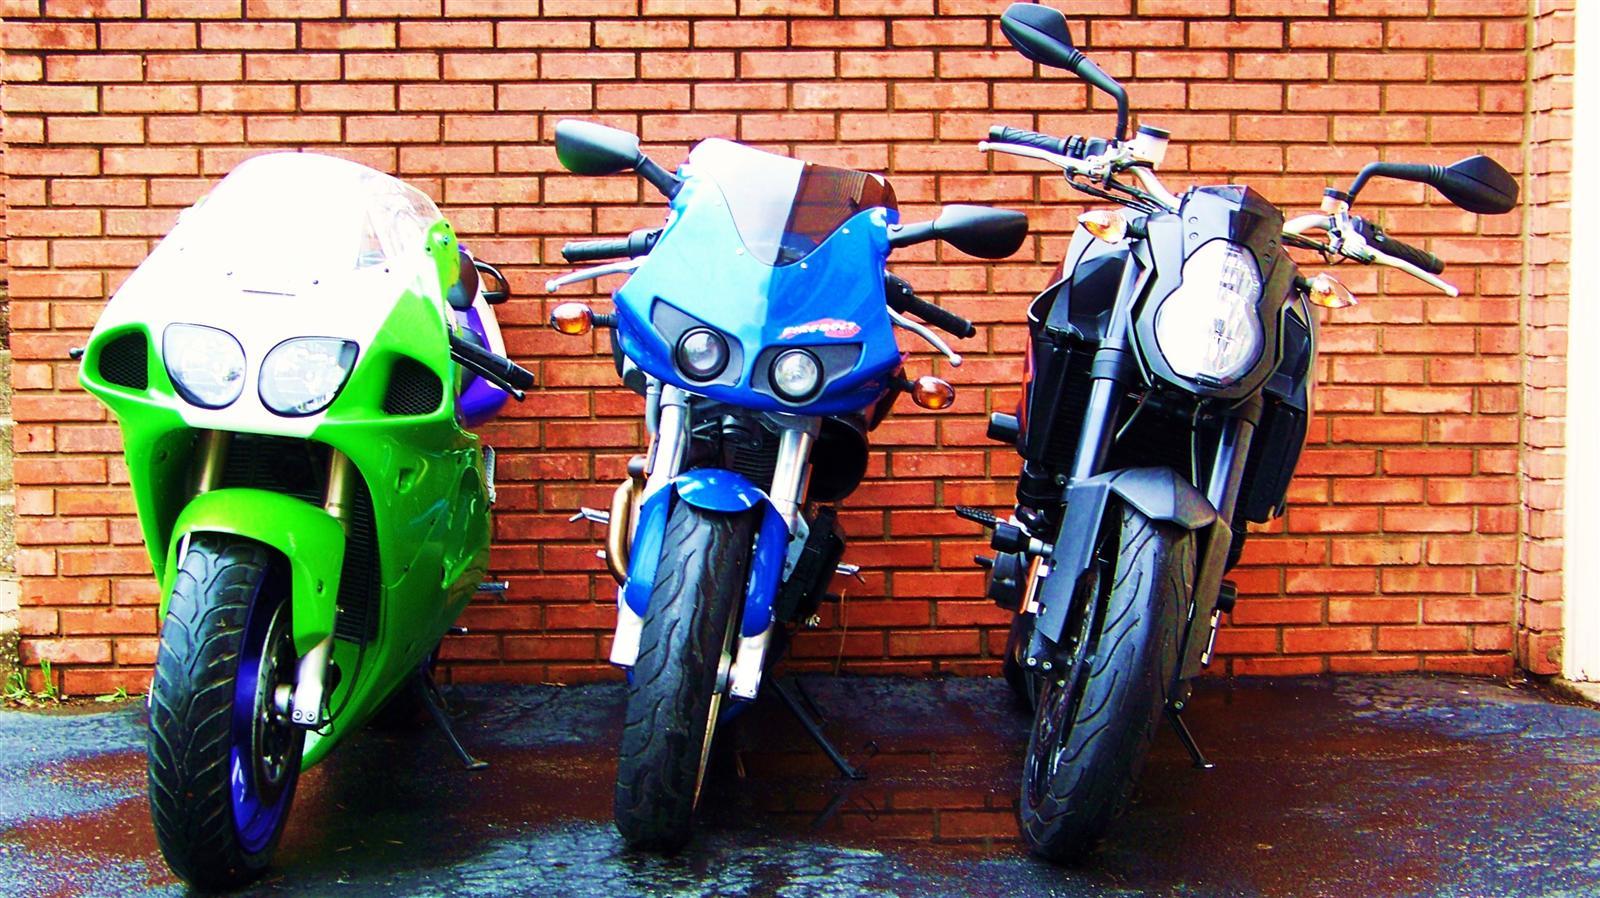 http://2.bp.blogspot.com/-C4US8UgvU3s/TmZ0H9vqMFI/AAAAAAAAAsc/7hbhQHBpGhA/s1600/Bikes+Wallpaper+%2528Custom%2529.JPG